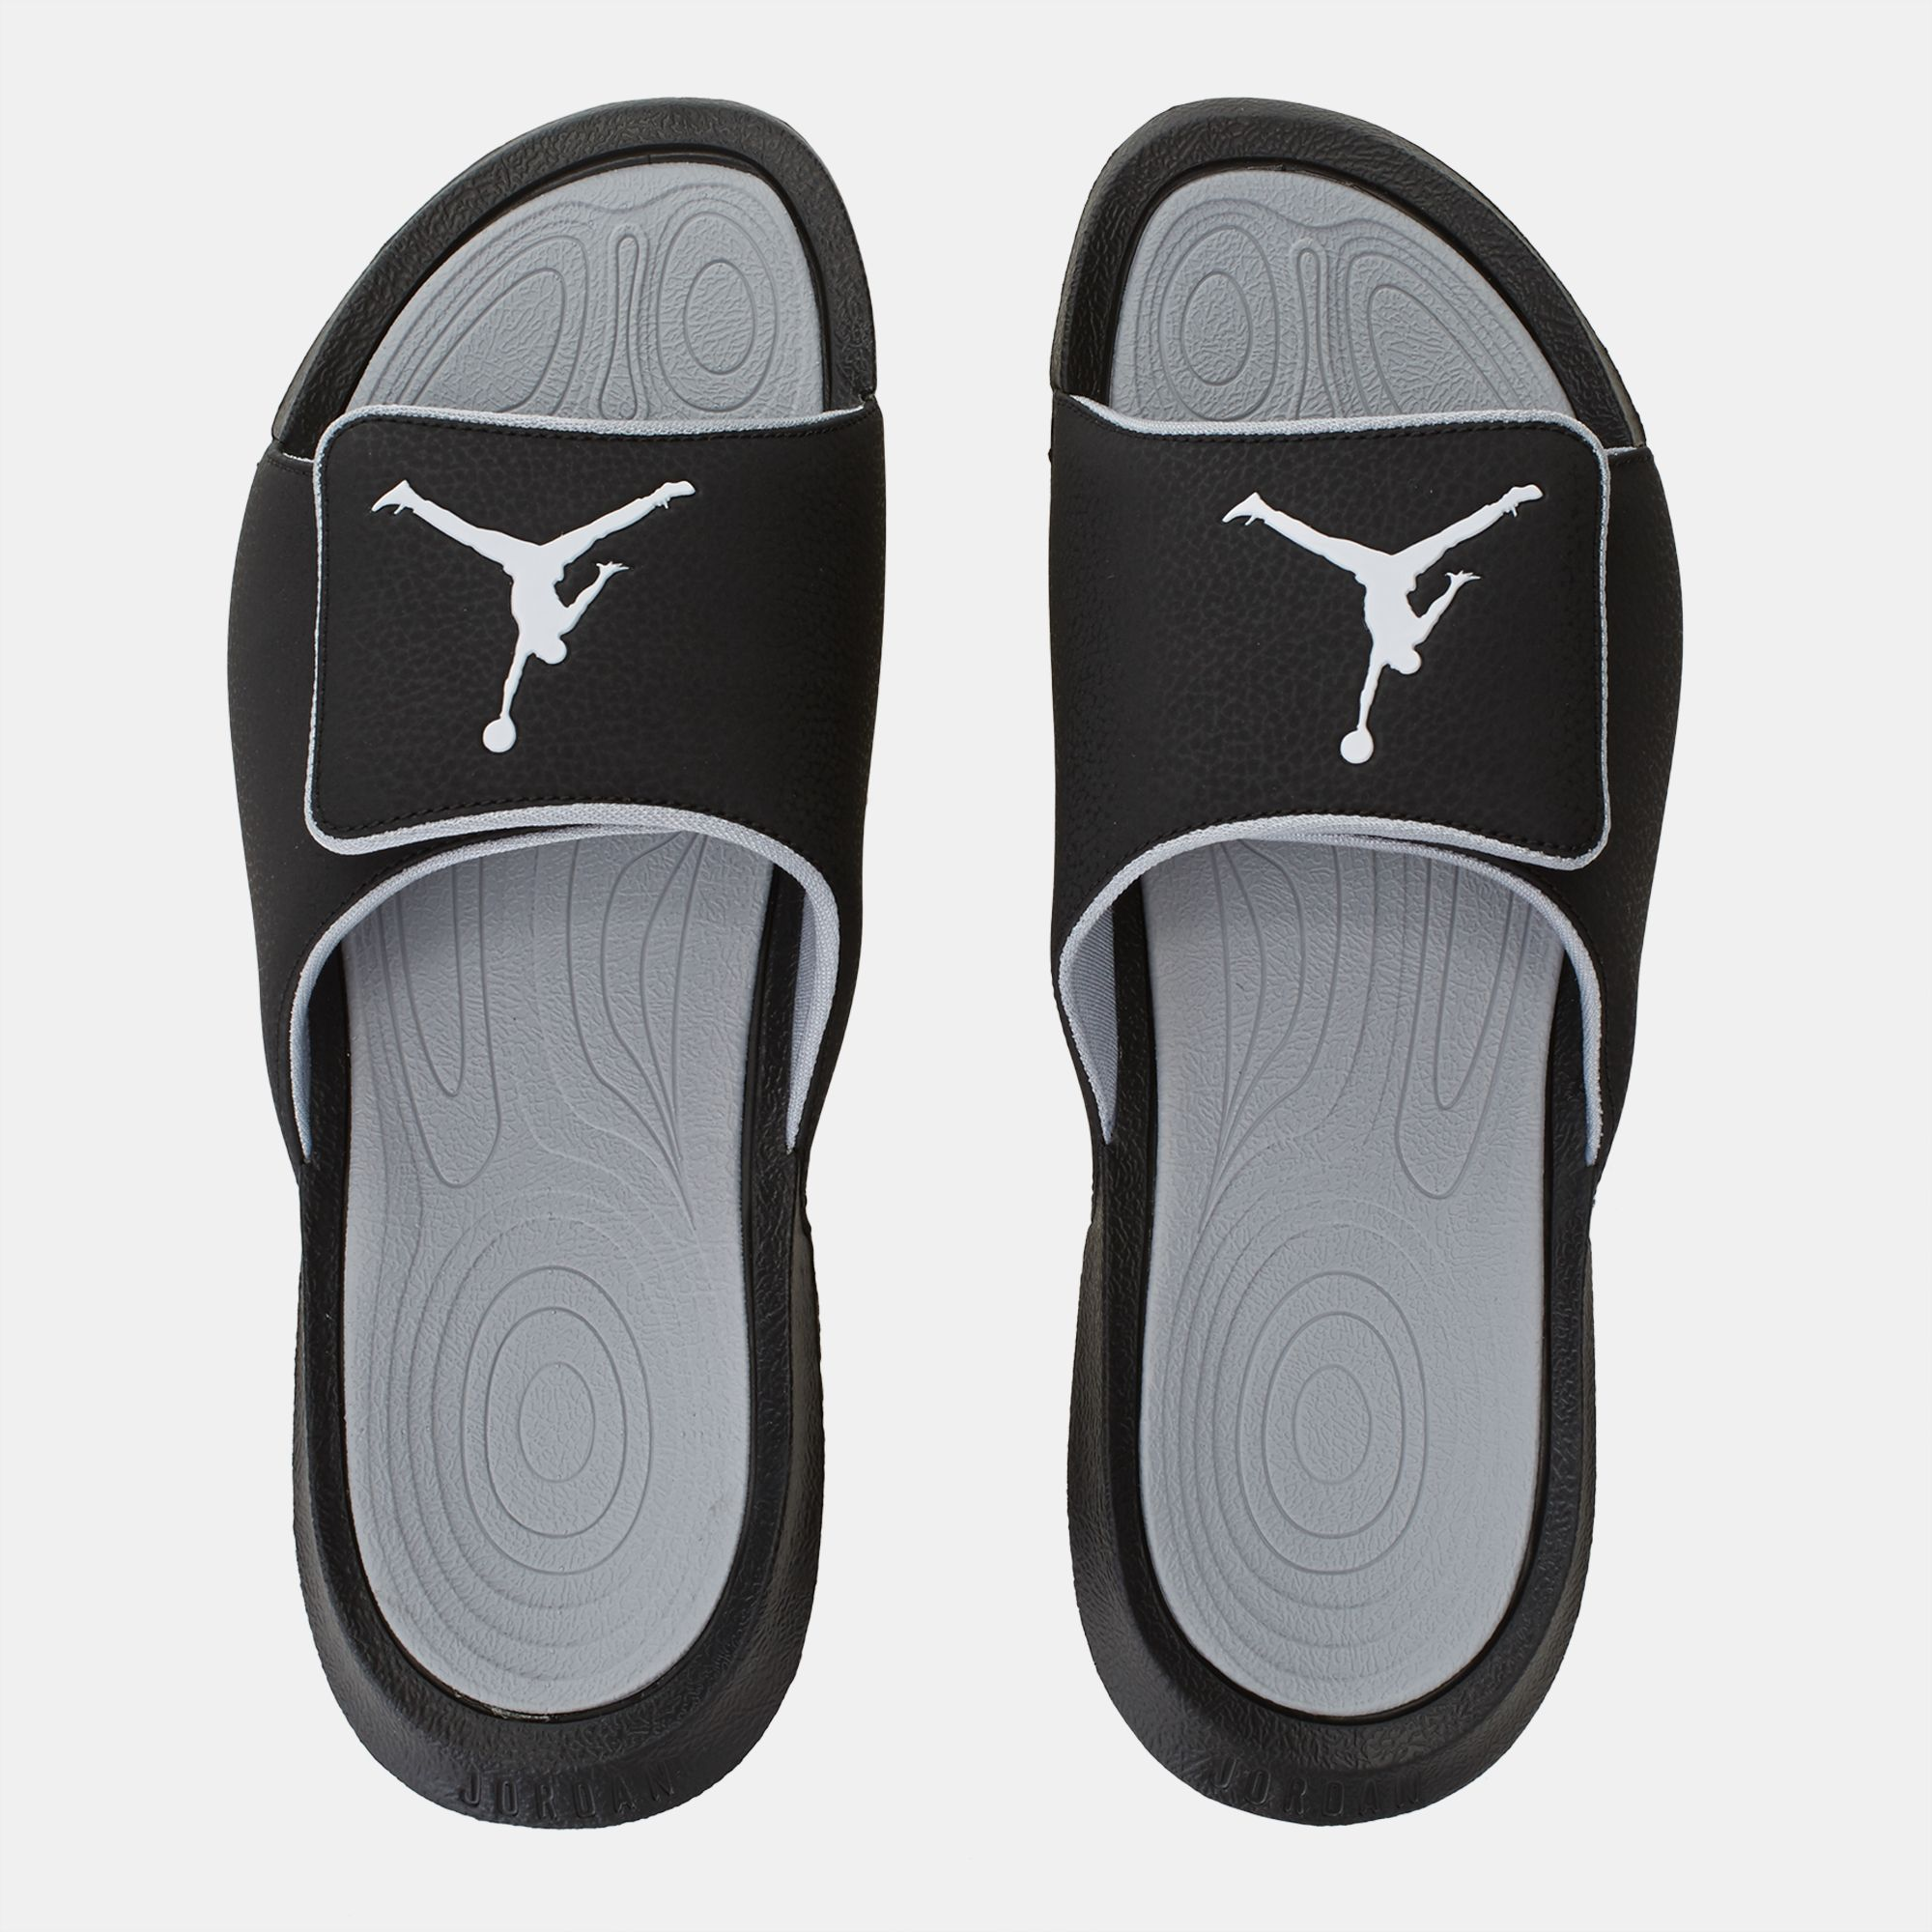 2201c1755 Shop Black Jordan Hydro 6 Slides for Mens by Jordan